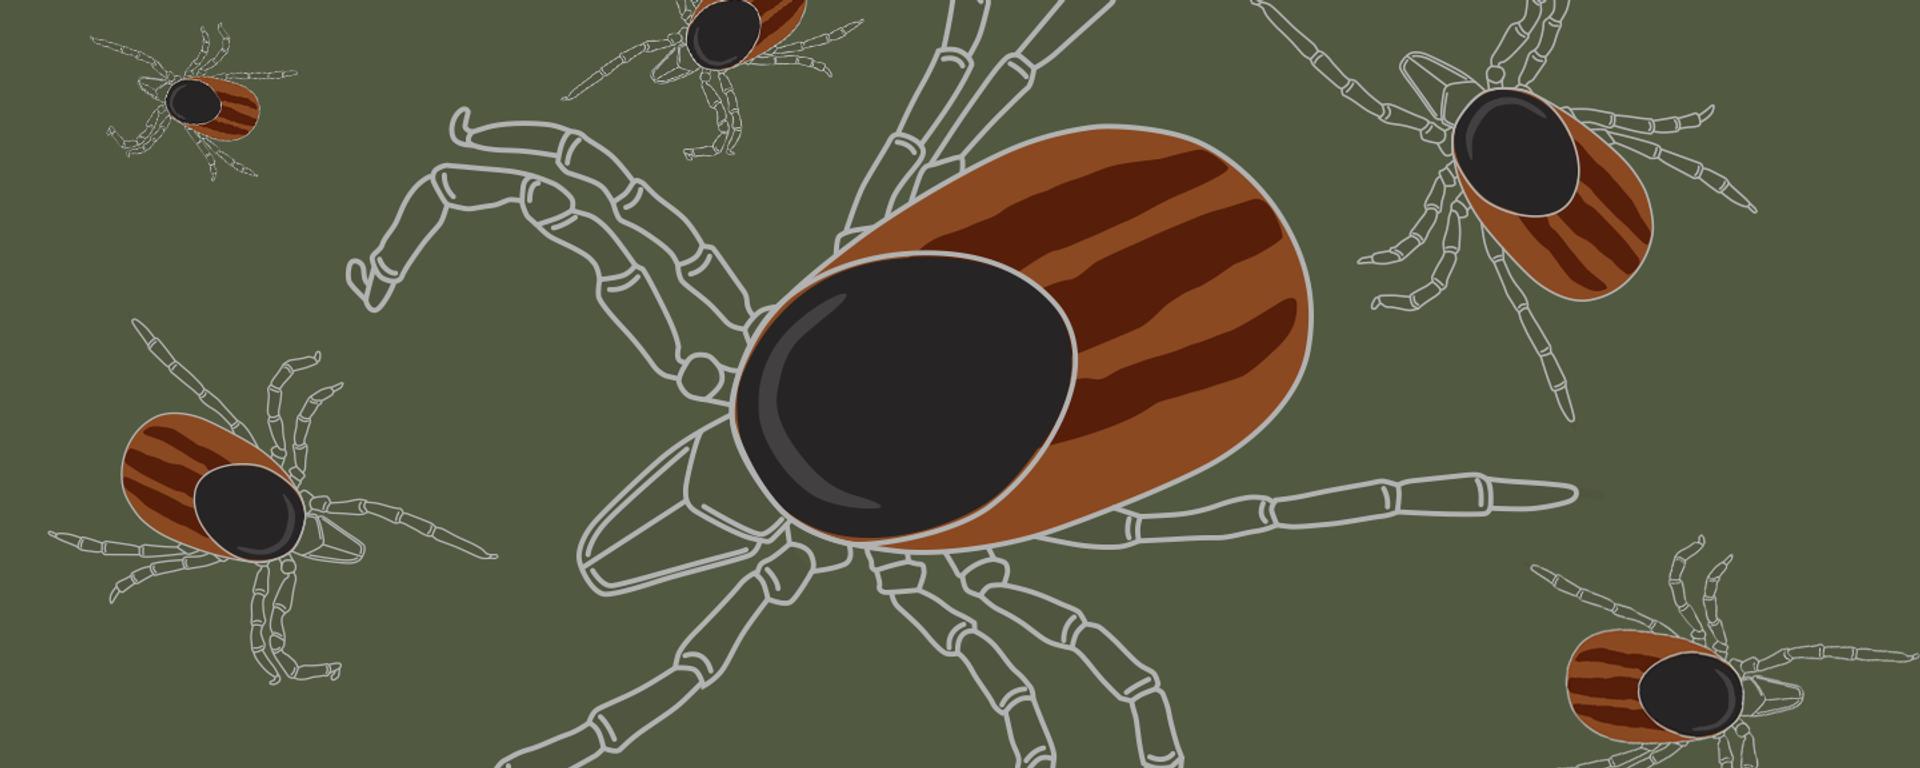 Защита от лесного клеща - Sputnik Латвия, 1920, 30.06.2021